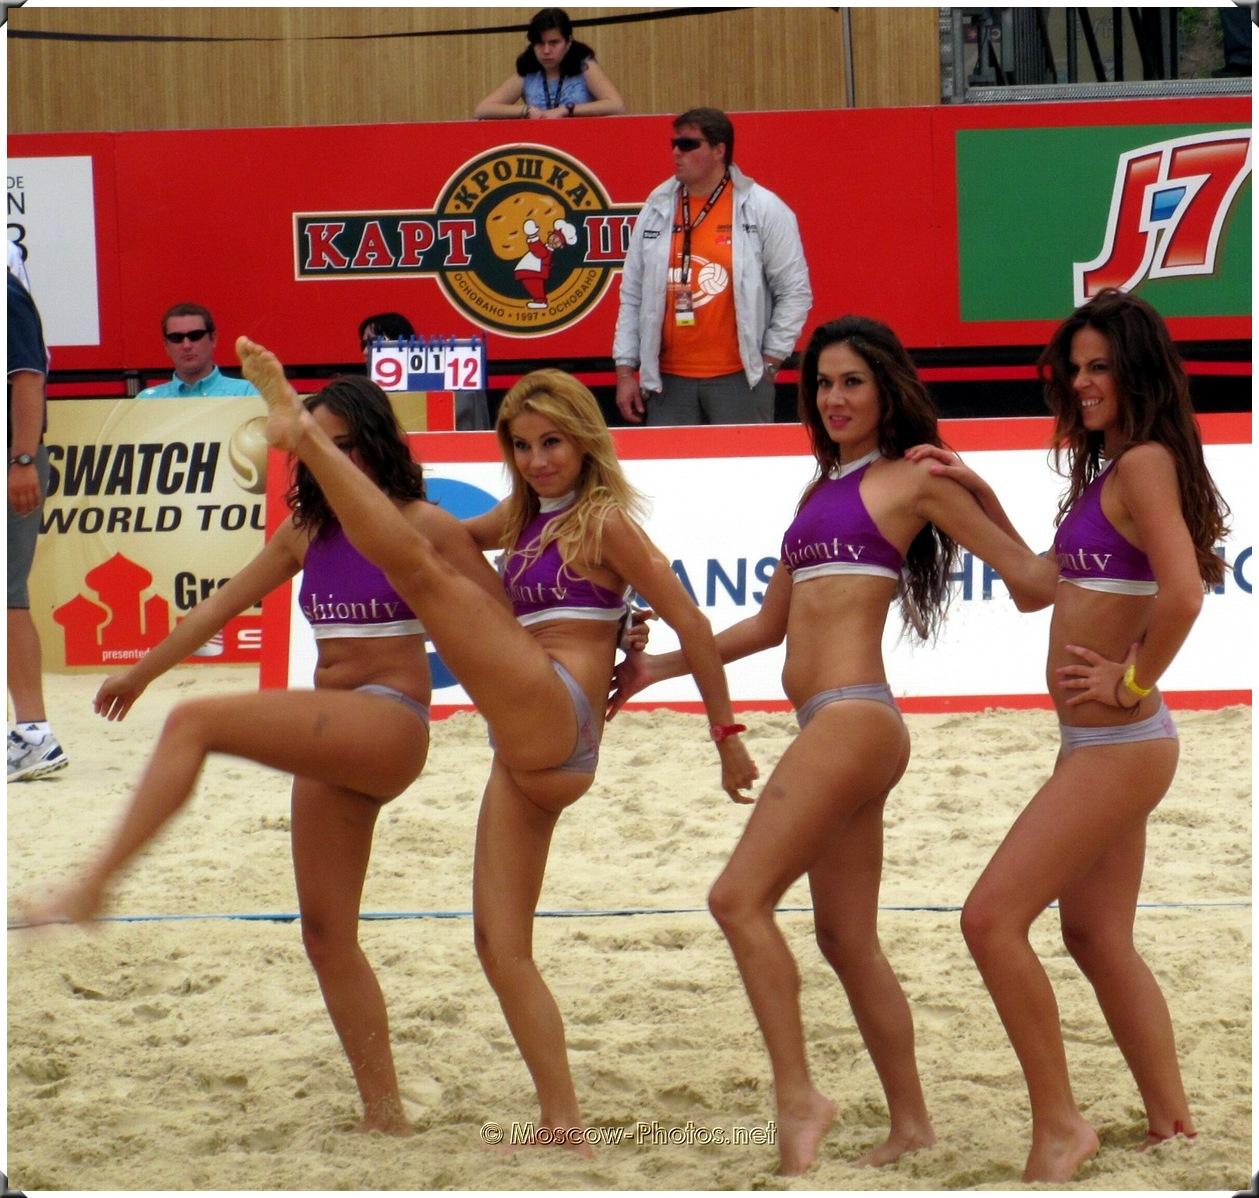 Beach Volley Dancing Bikini Cheerleaders